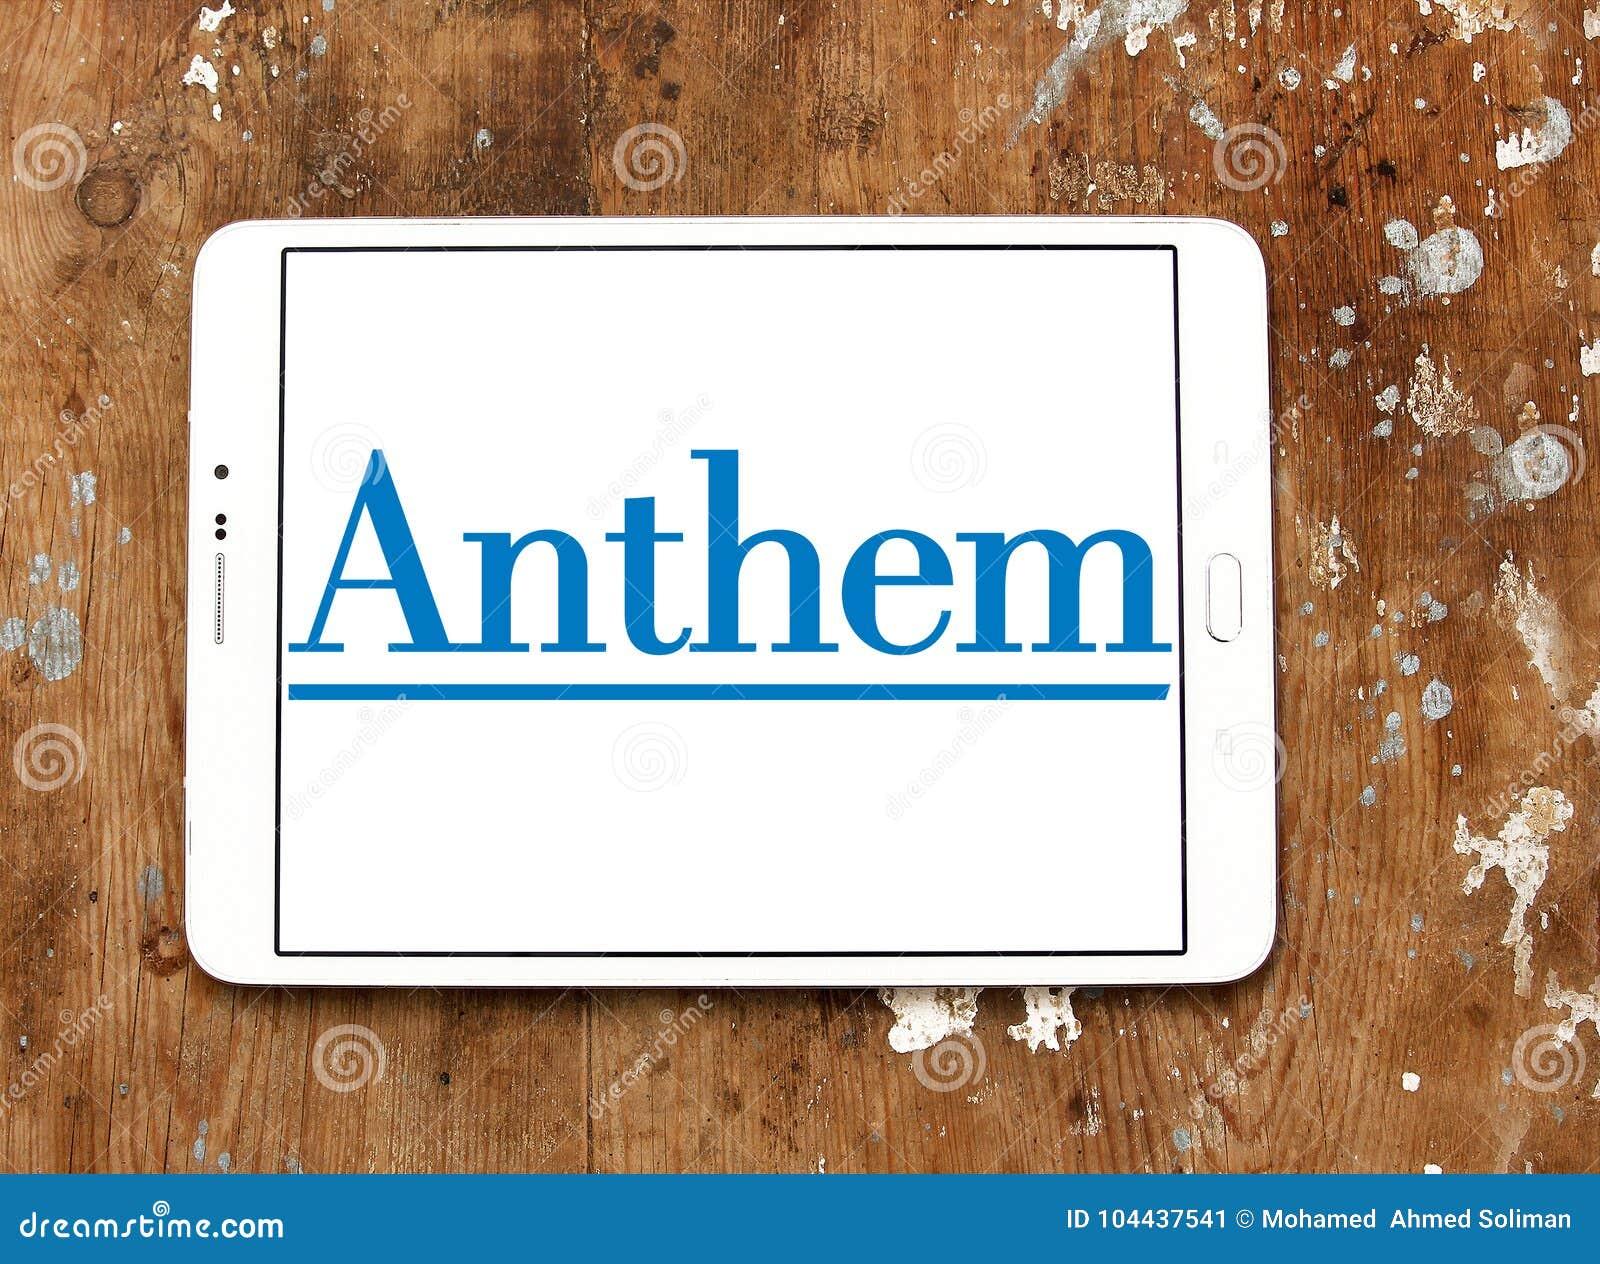 Anthem Health Insurance Company Logo Editorial Photo - Image